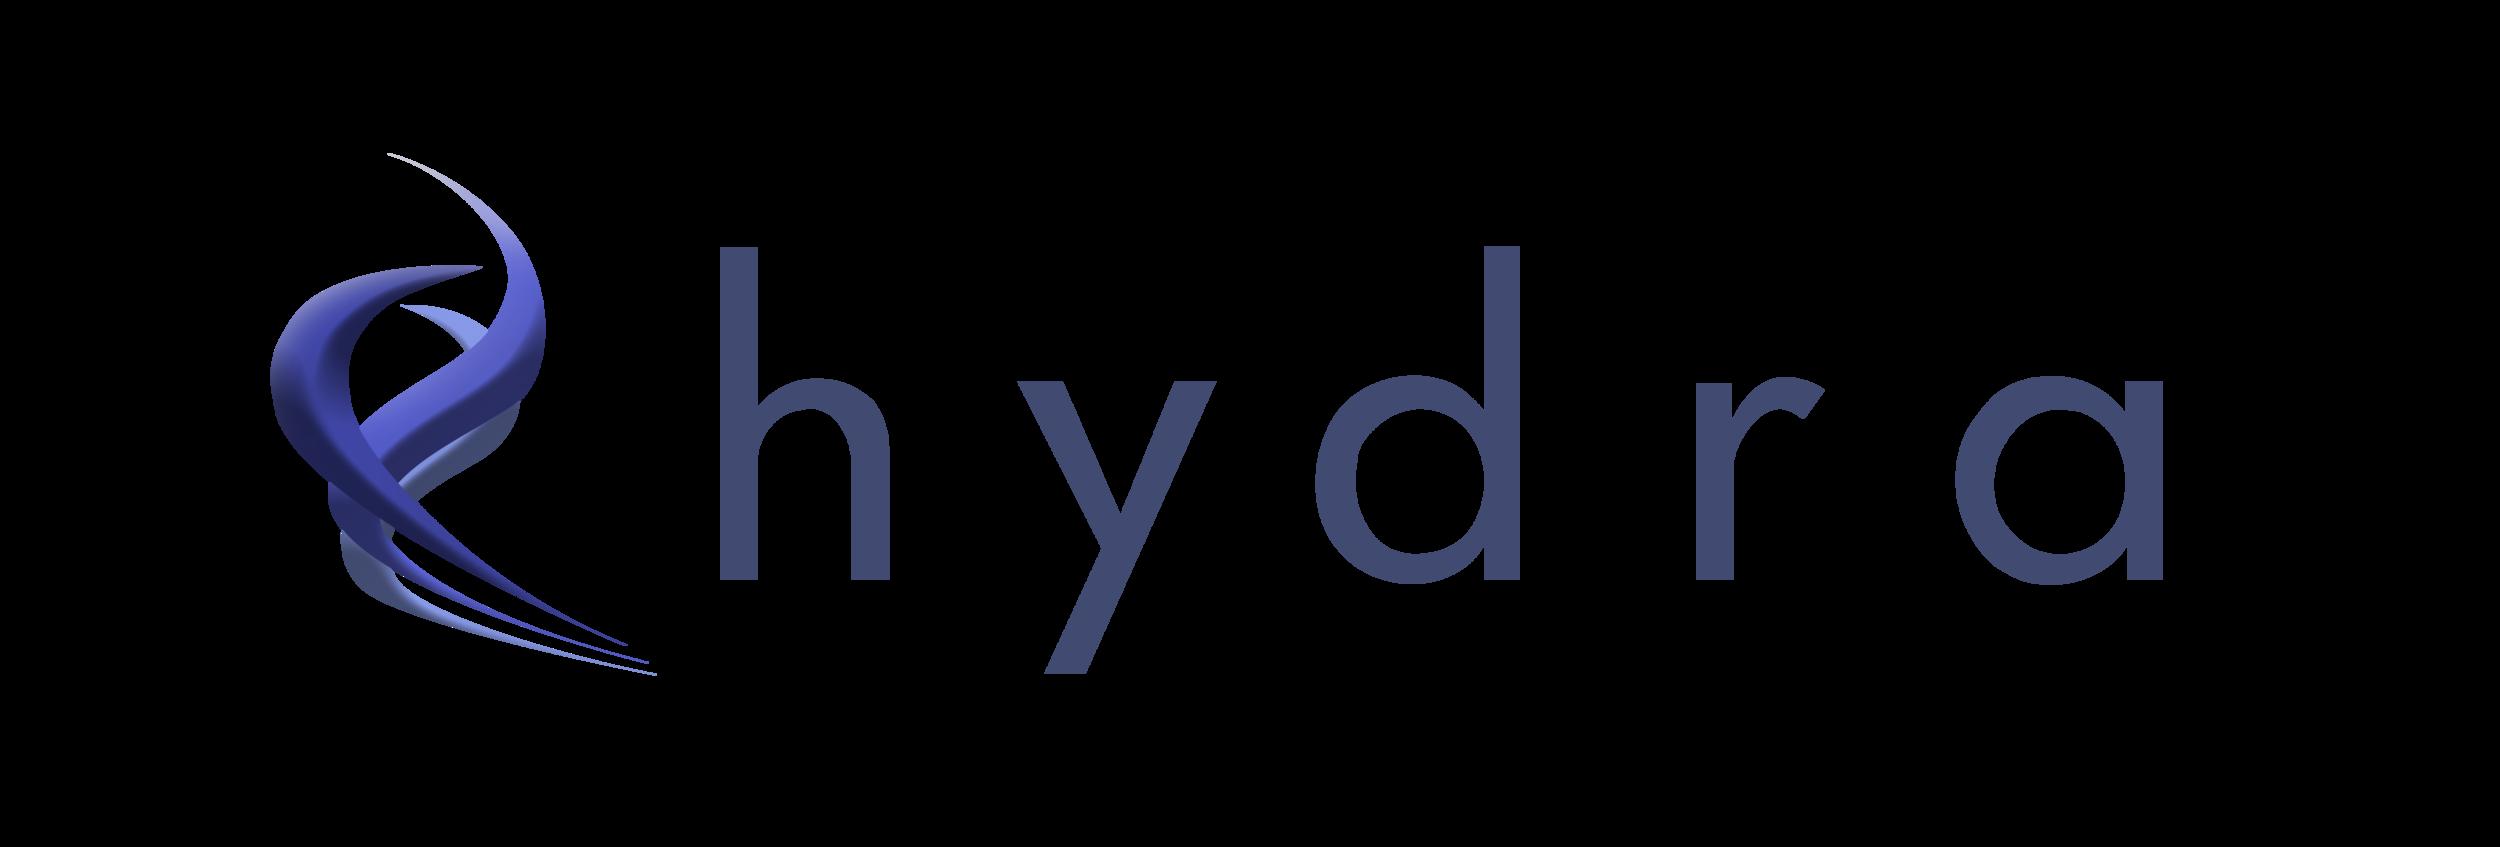 hydra-typo-.png